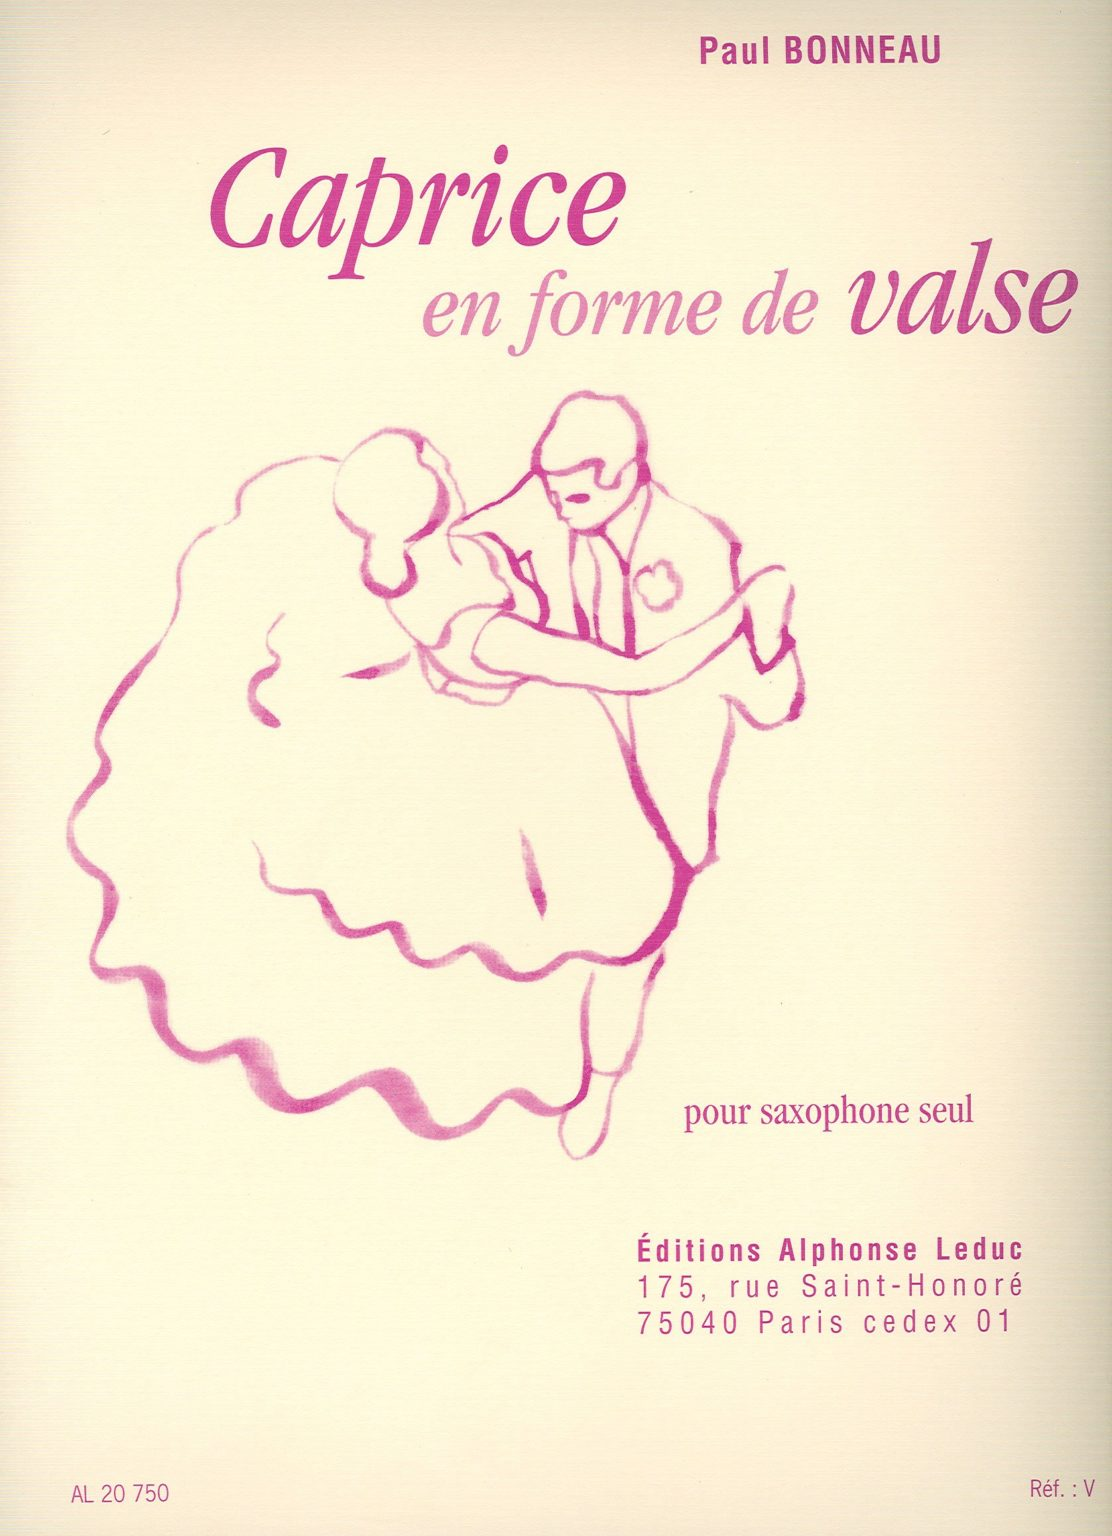 Capriceenformedevalse(1950). Paul Bonneau